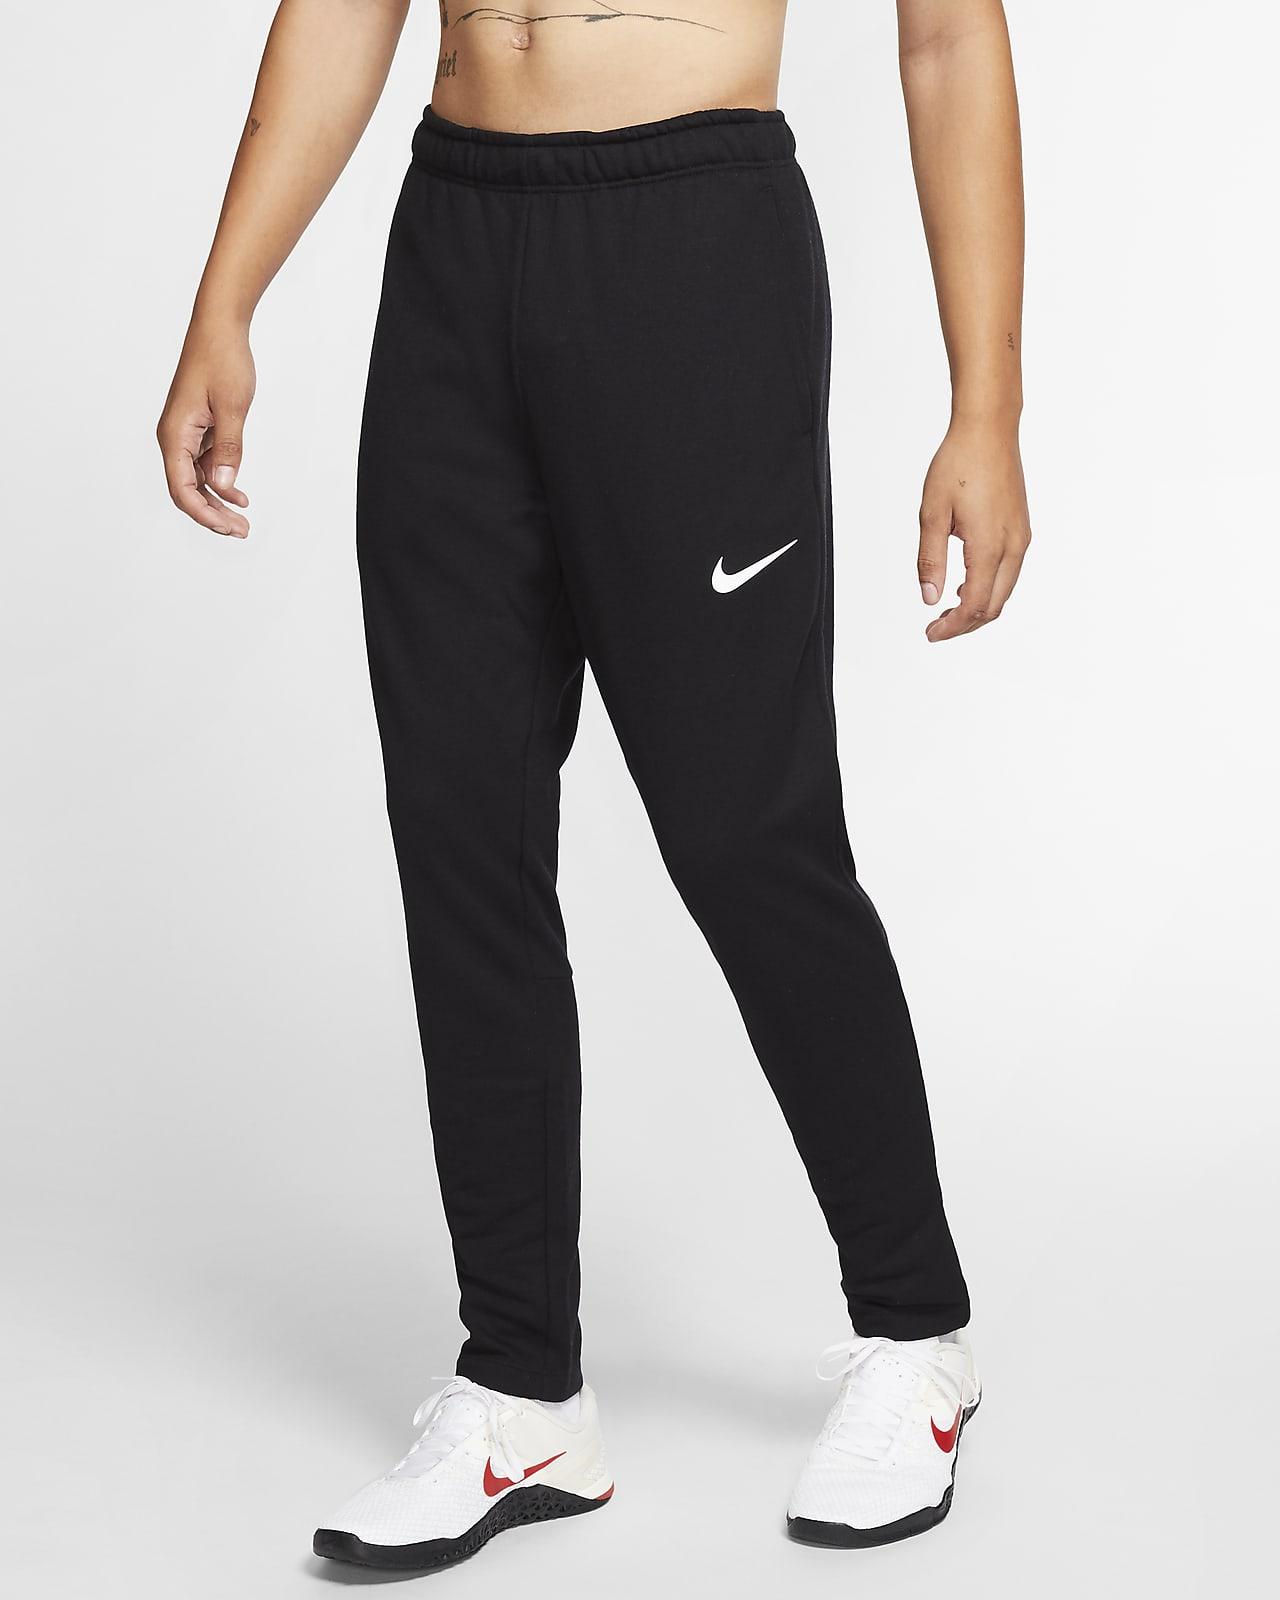 Nike Dri-FIT Men's Fleece Training Pants